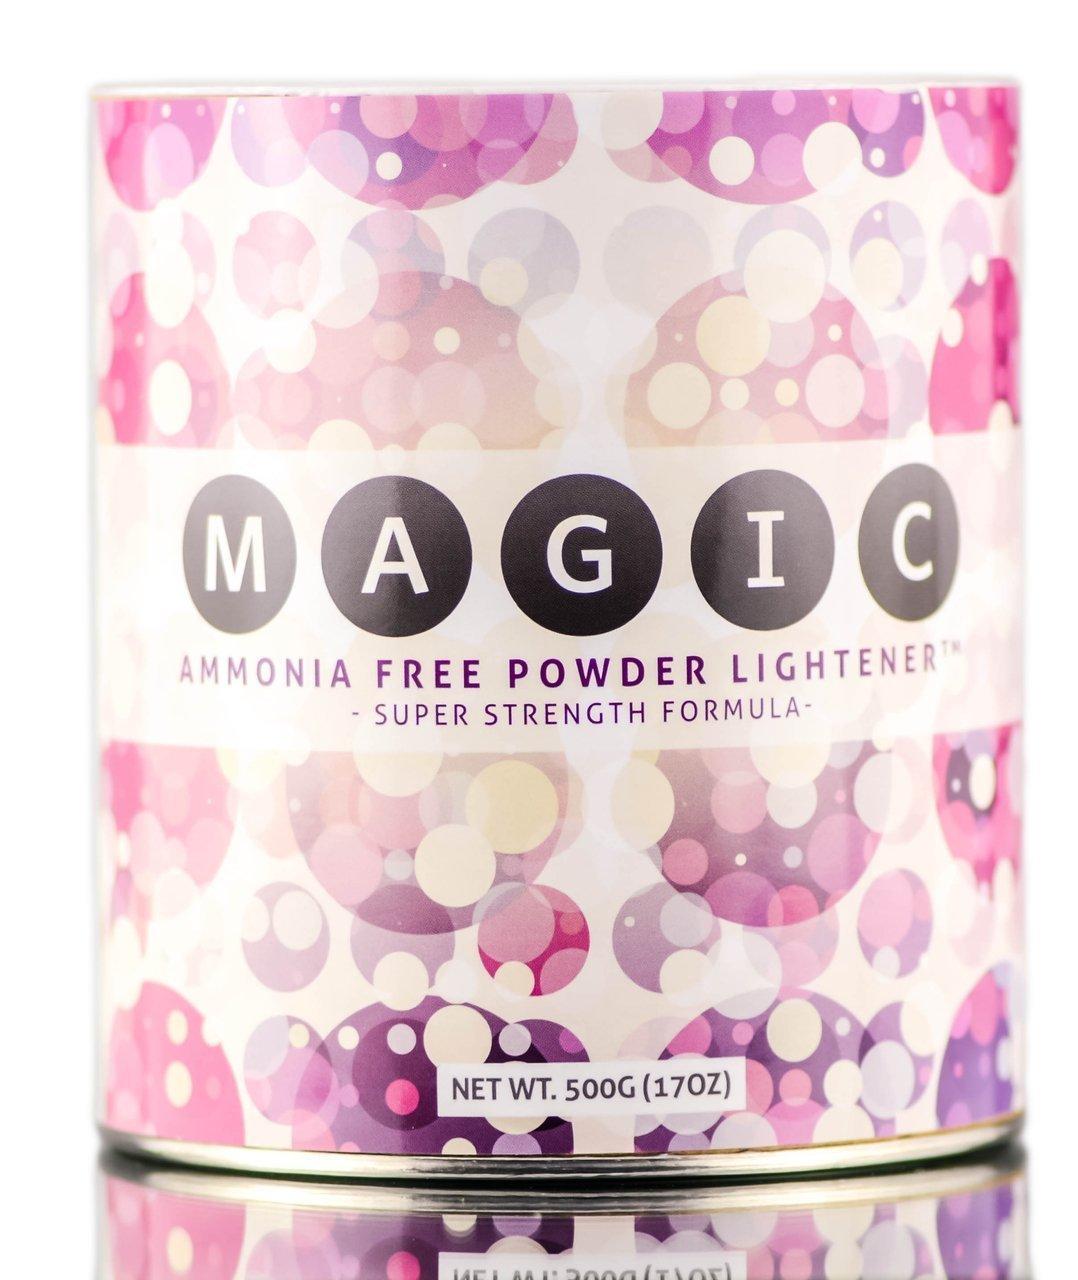 MAGIC Ammonia-Free POWDER Lightener - Super Strength Formula (500 g / 17 oz)